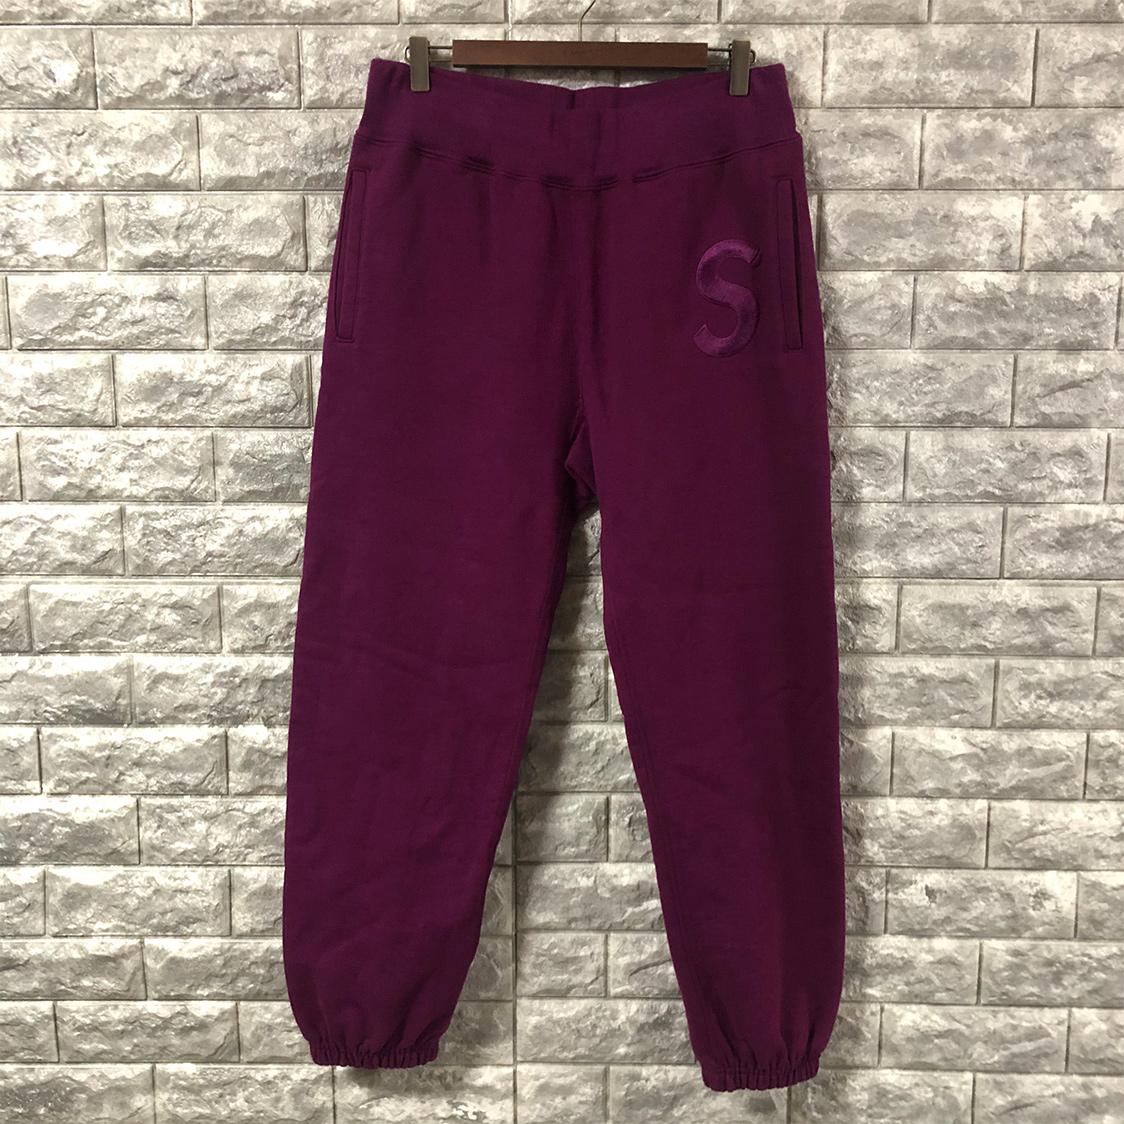 SUPREME シュプリーム 【Sサイズ】 スウェット パンツ パープル イニシャル 紫